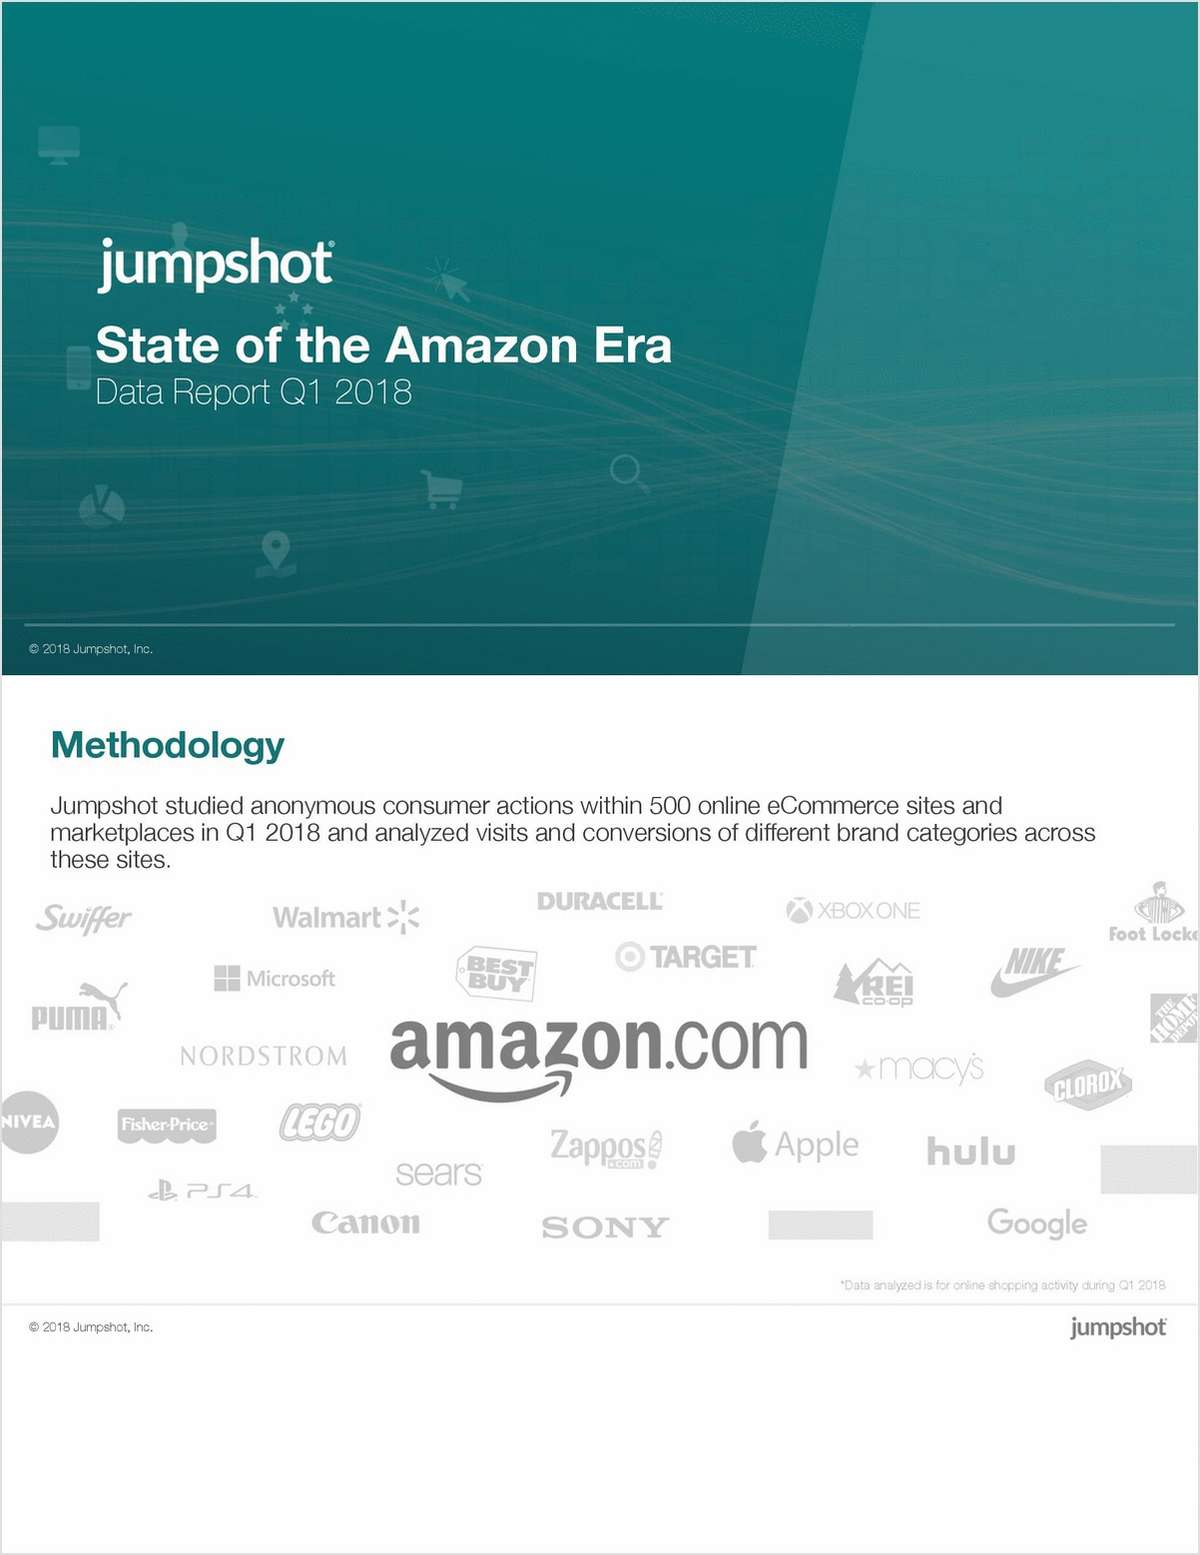 State of the Amazon Era Data Report